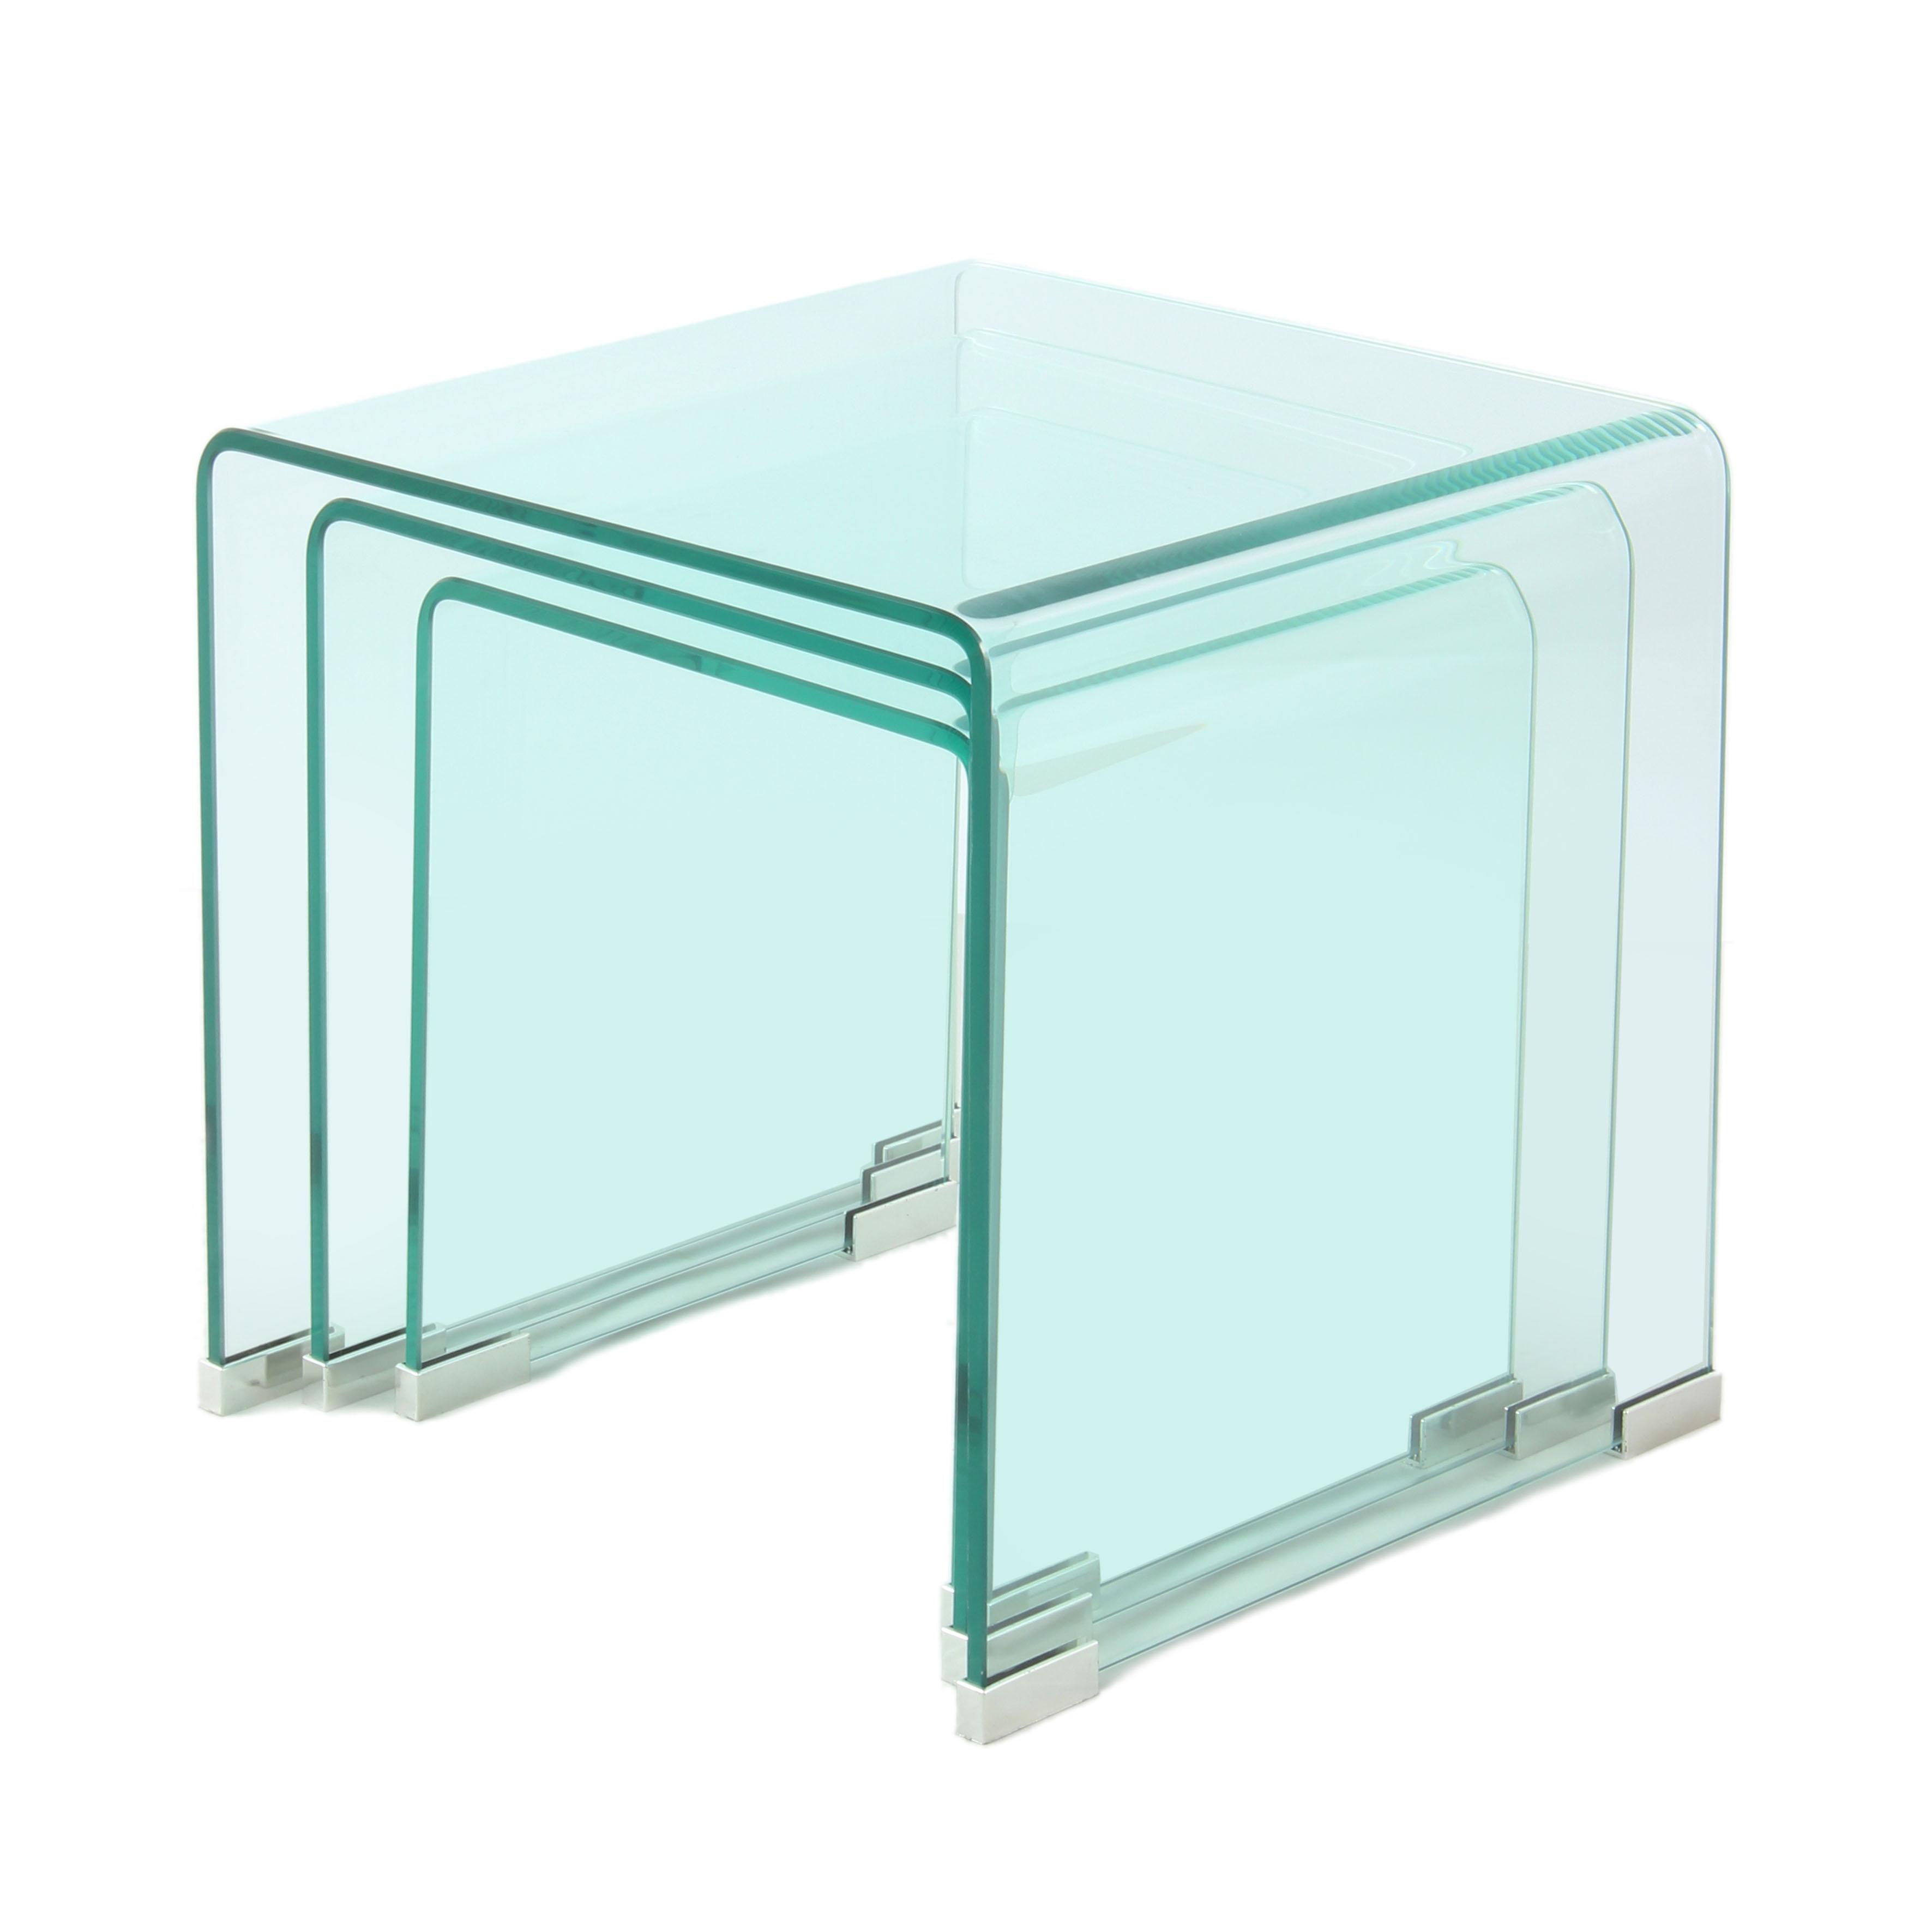 Set Van 3 Glazen Bijzettafels.Bijzettafels Cor Glas Set Van 3